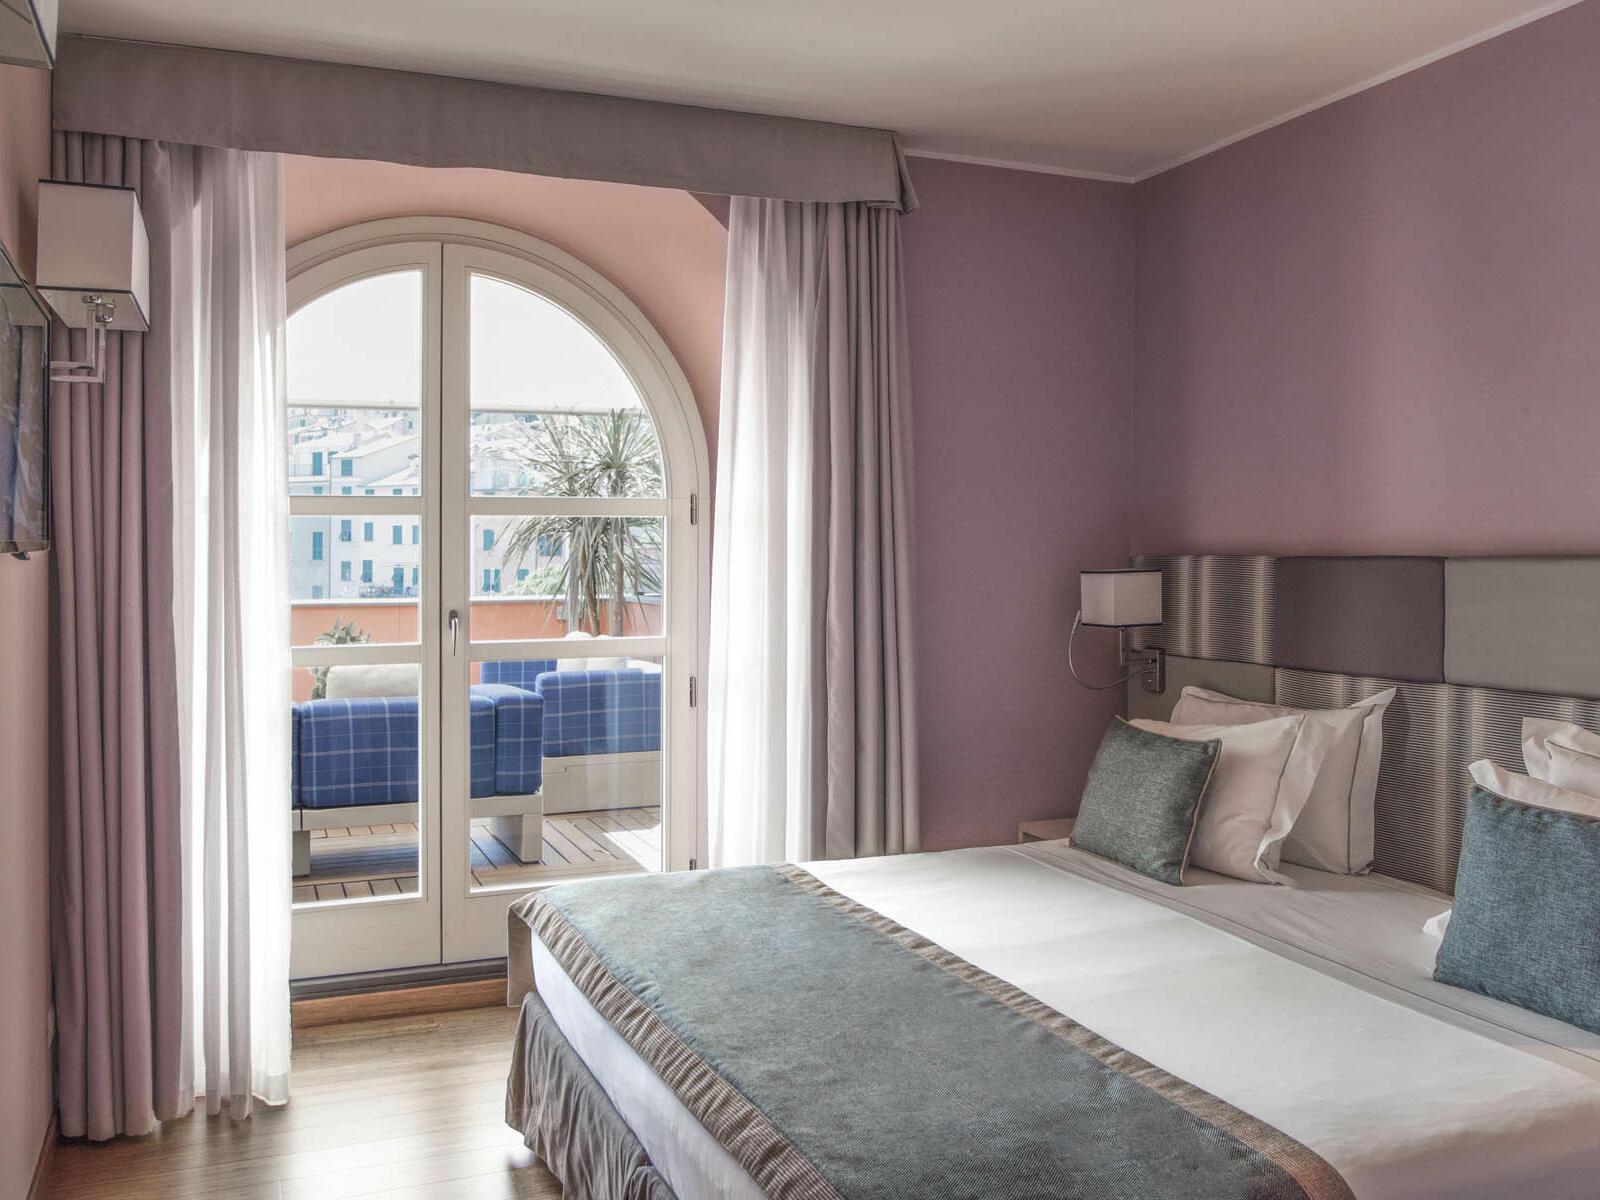 Comfy Bedroom - Grand Hotel Portovenere